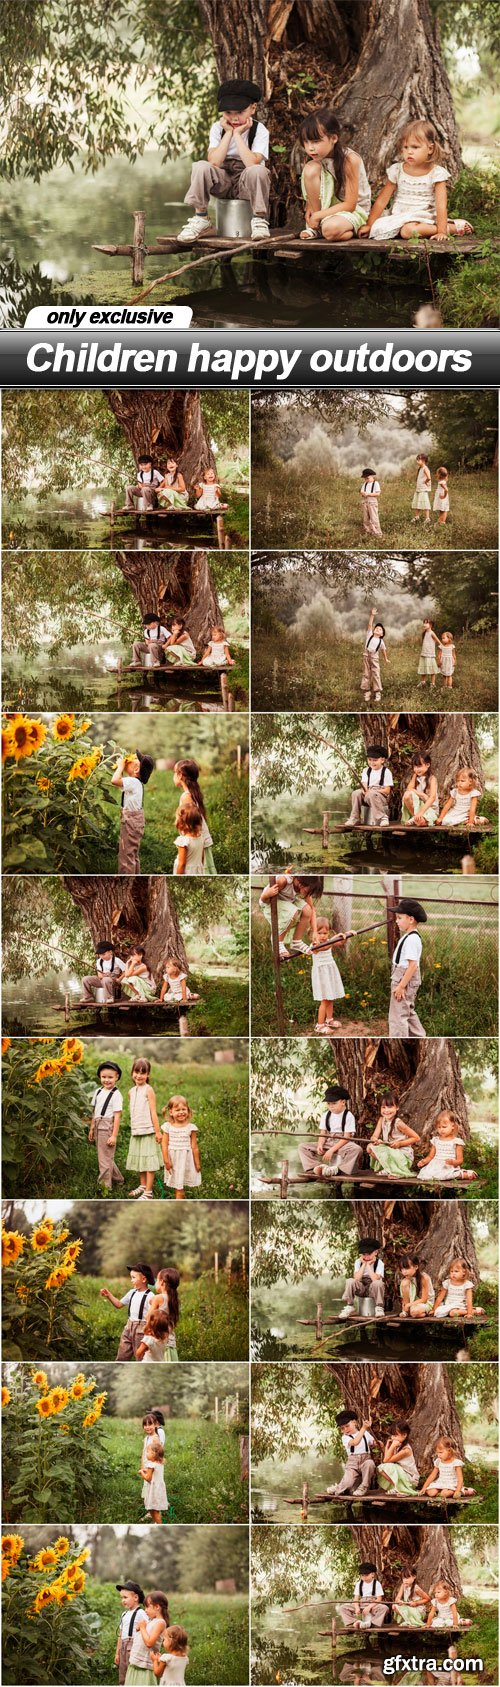 Children happy outdoors - 16 UHQ JPEG